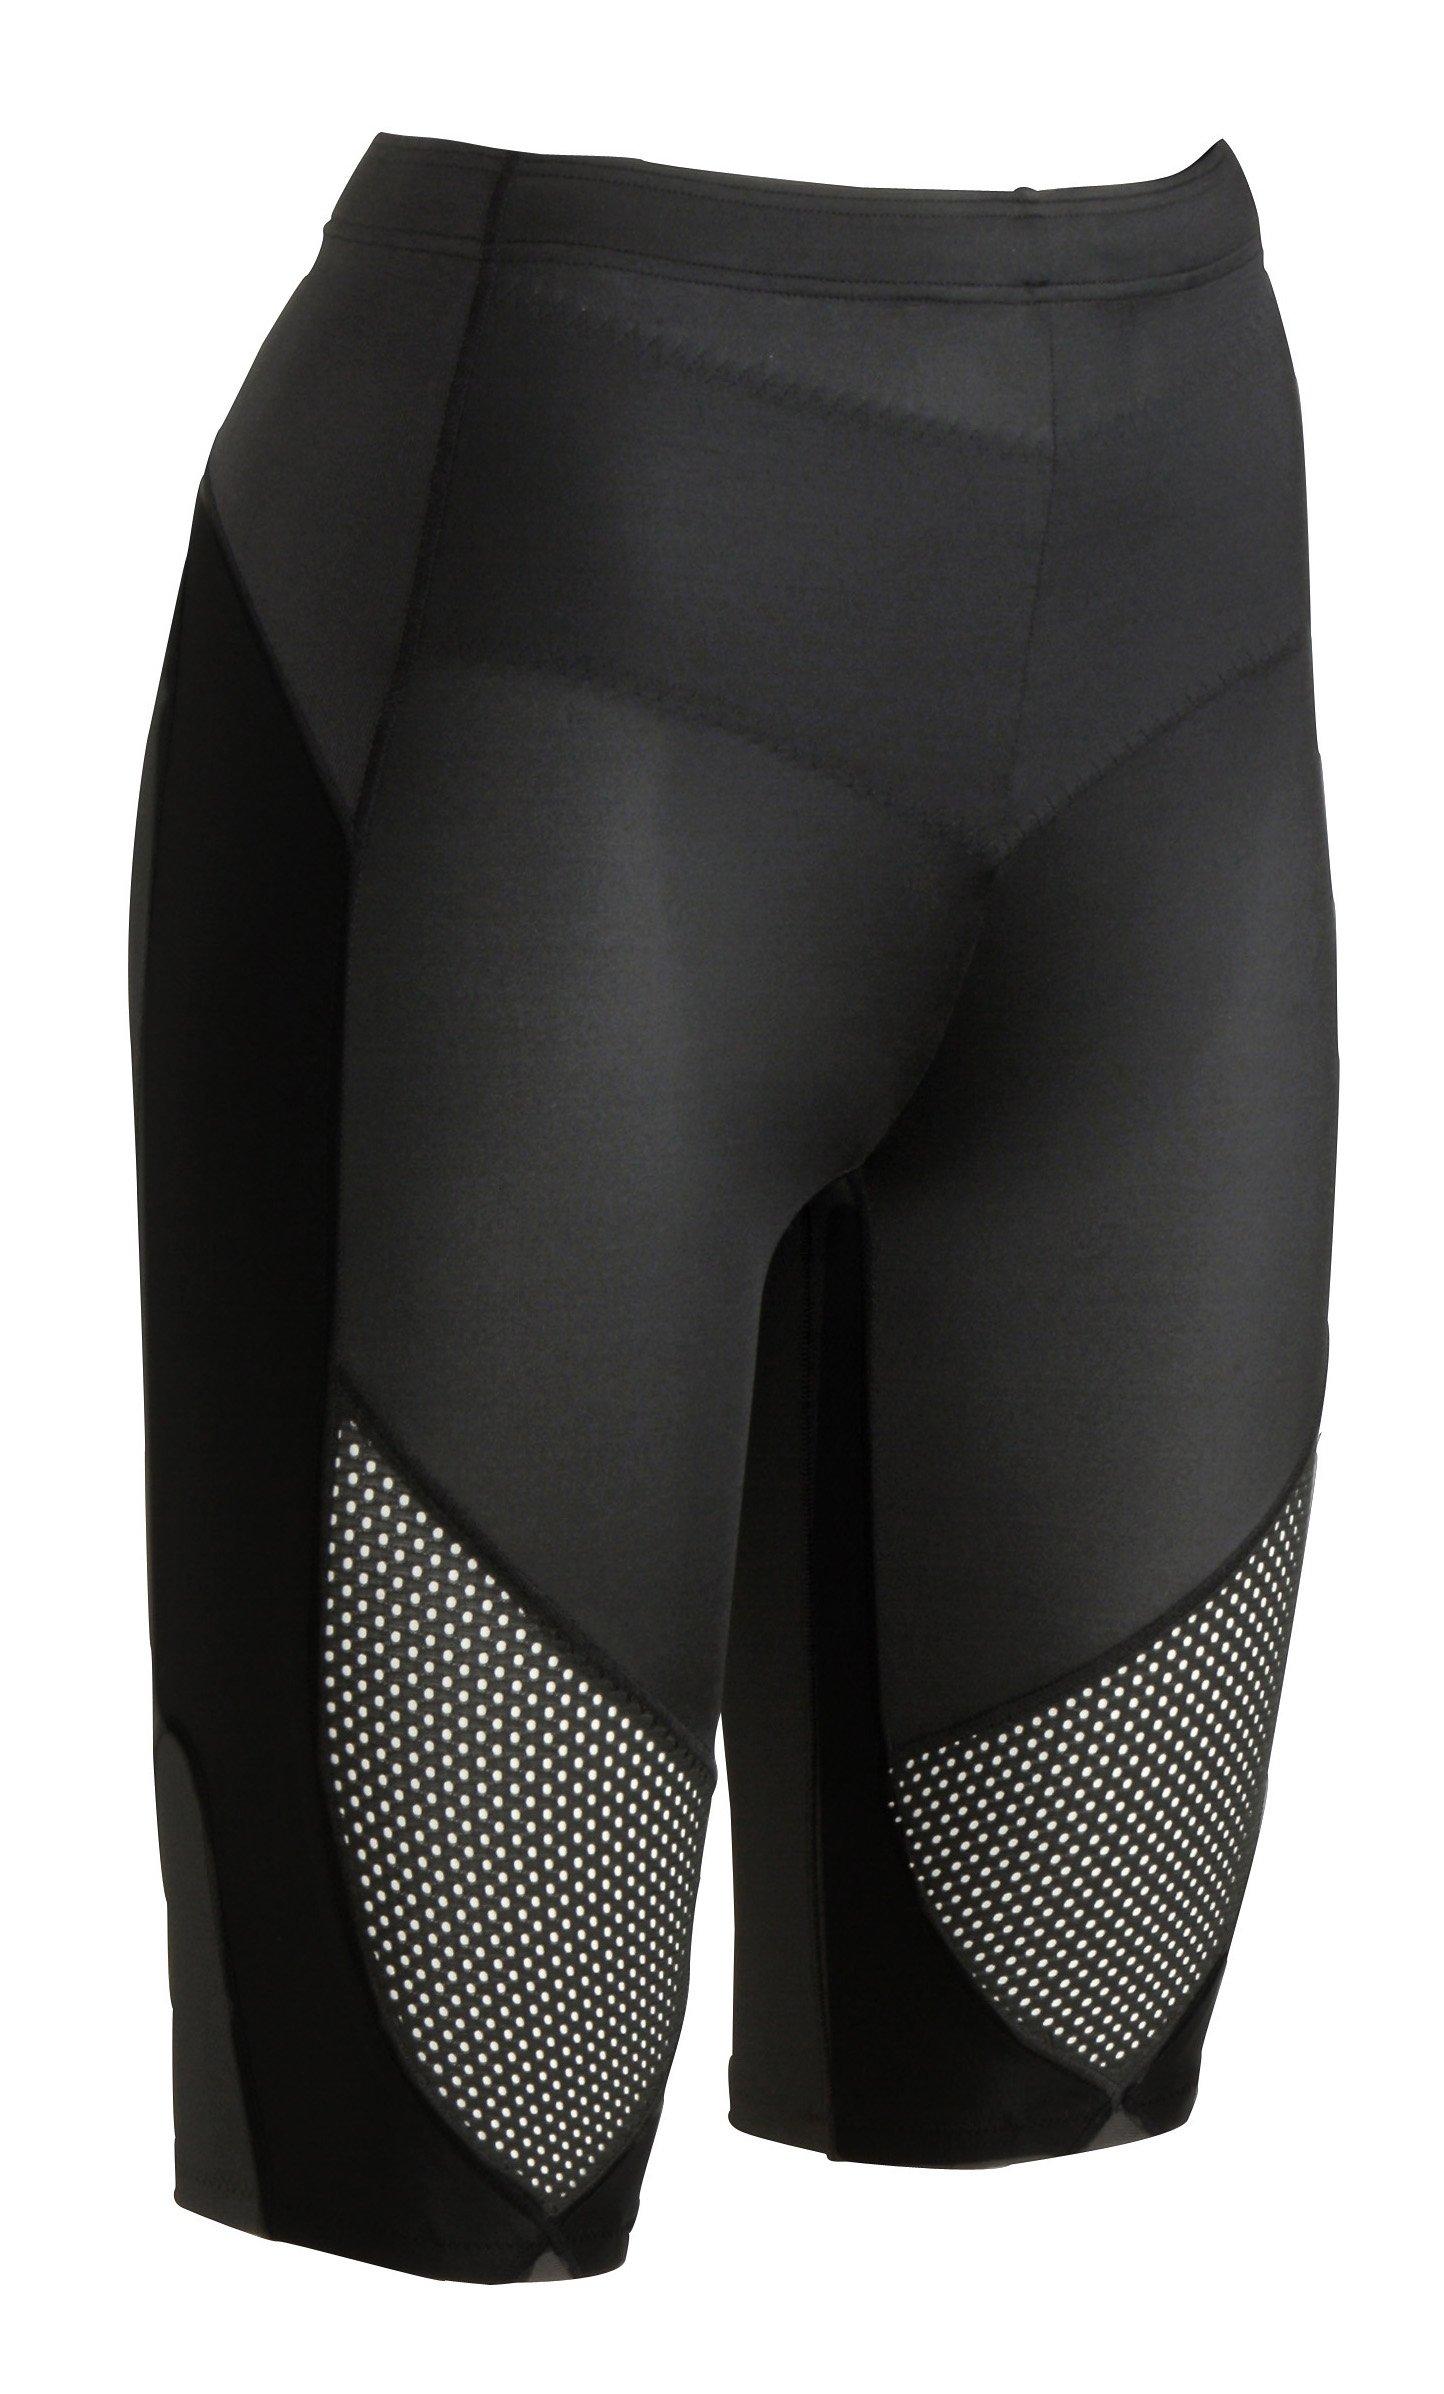 CW-X Women's Stabilyx Ventilator Shorts (Black, X-Small) by CW-X (Image #1)